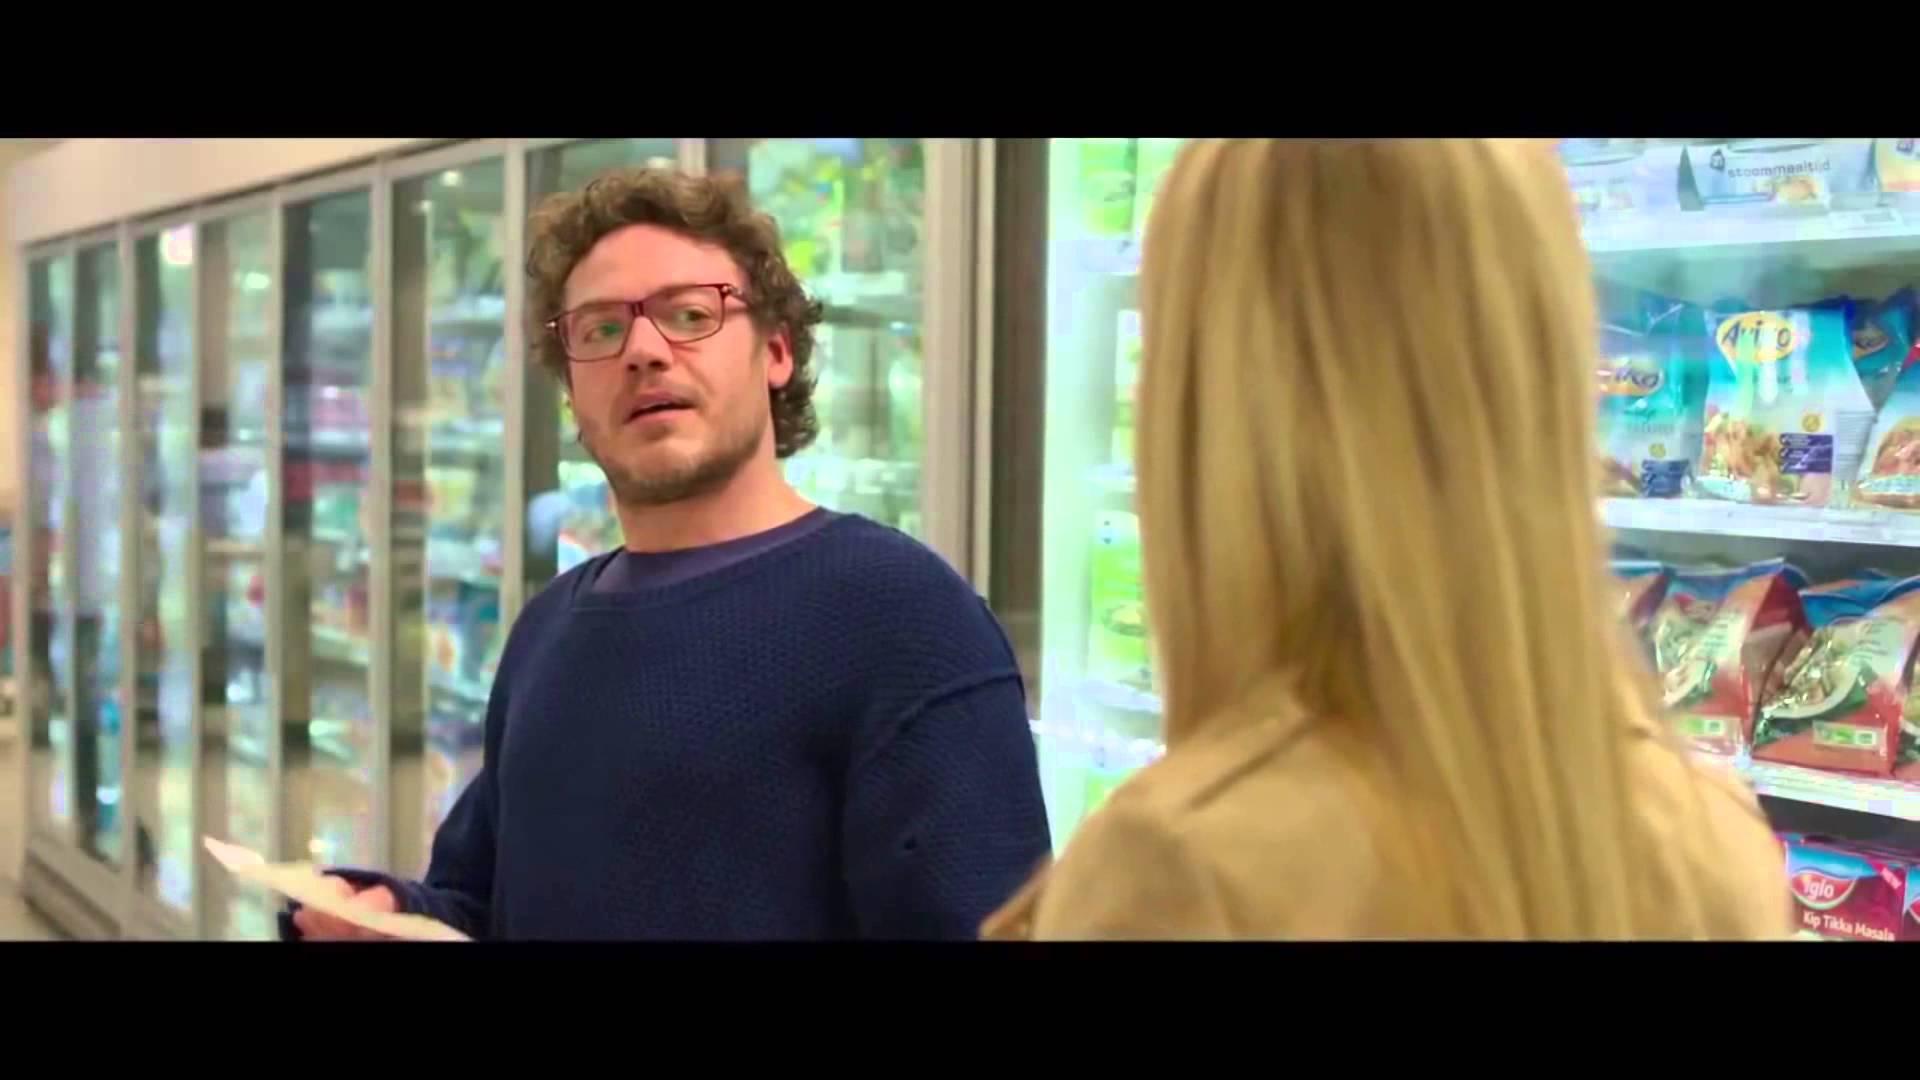 Soof (2013) video/trailer